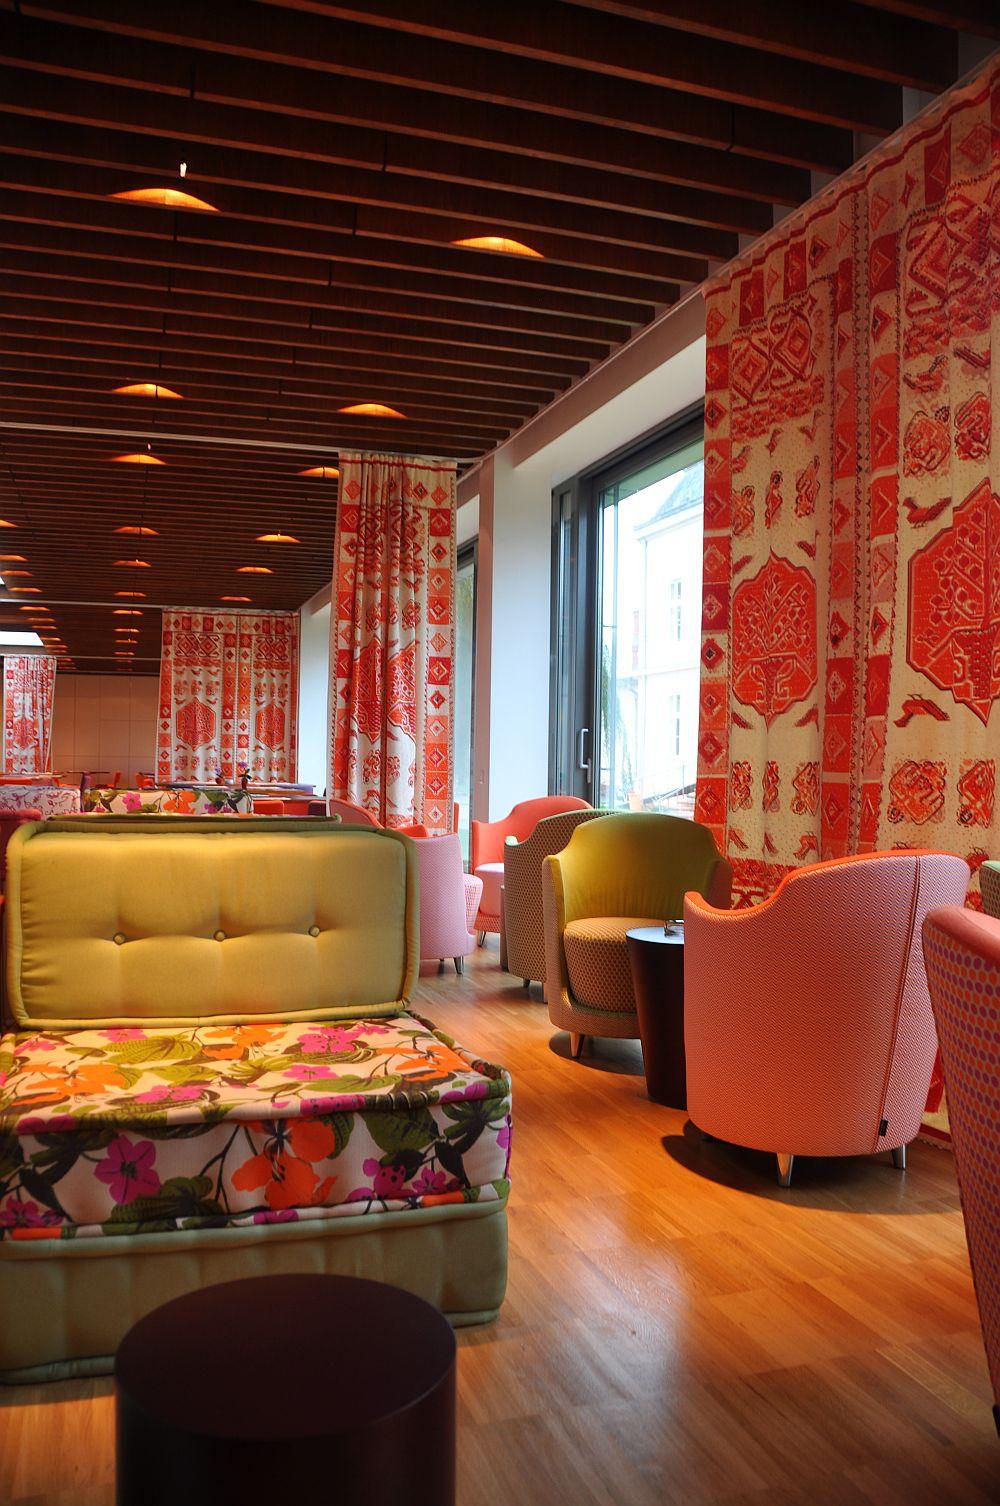 adelaparvu.com despre amenajare Hotel Gerald's Arhitectura Tecto, Textile Dorina Horatau (6)